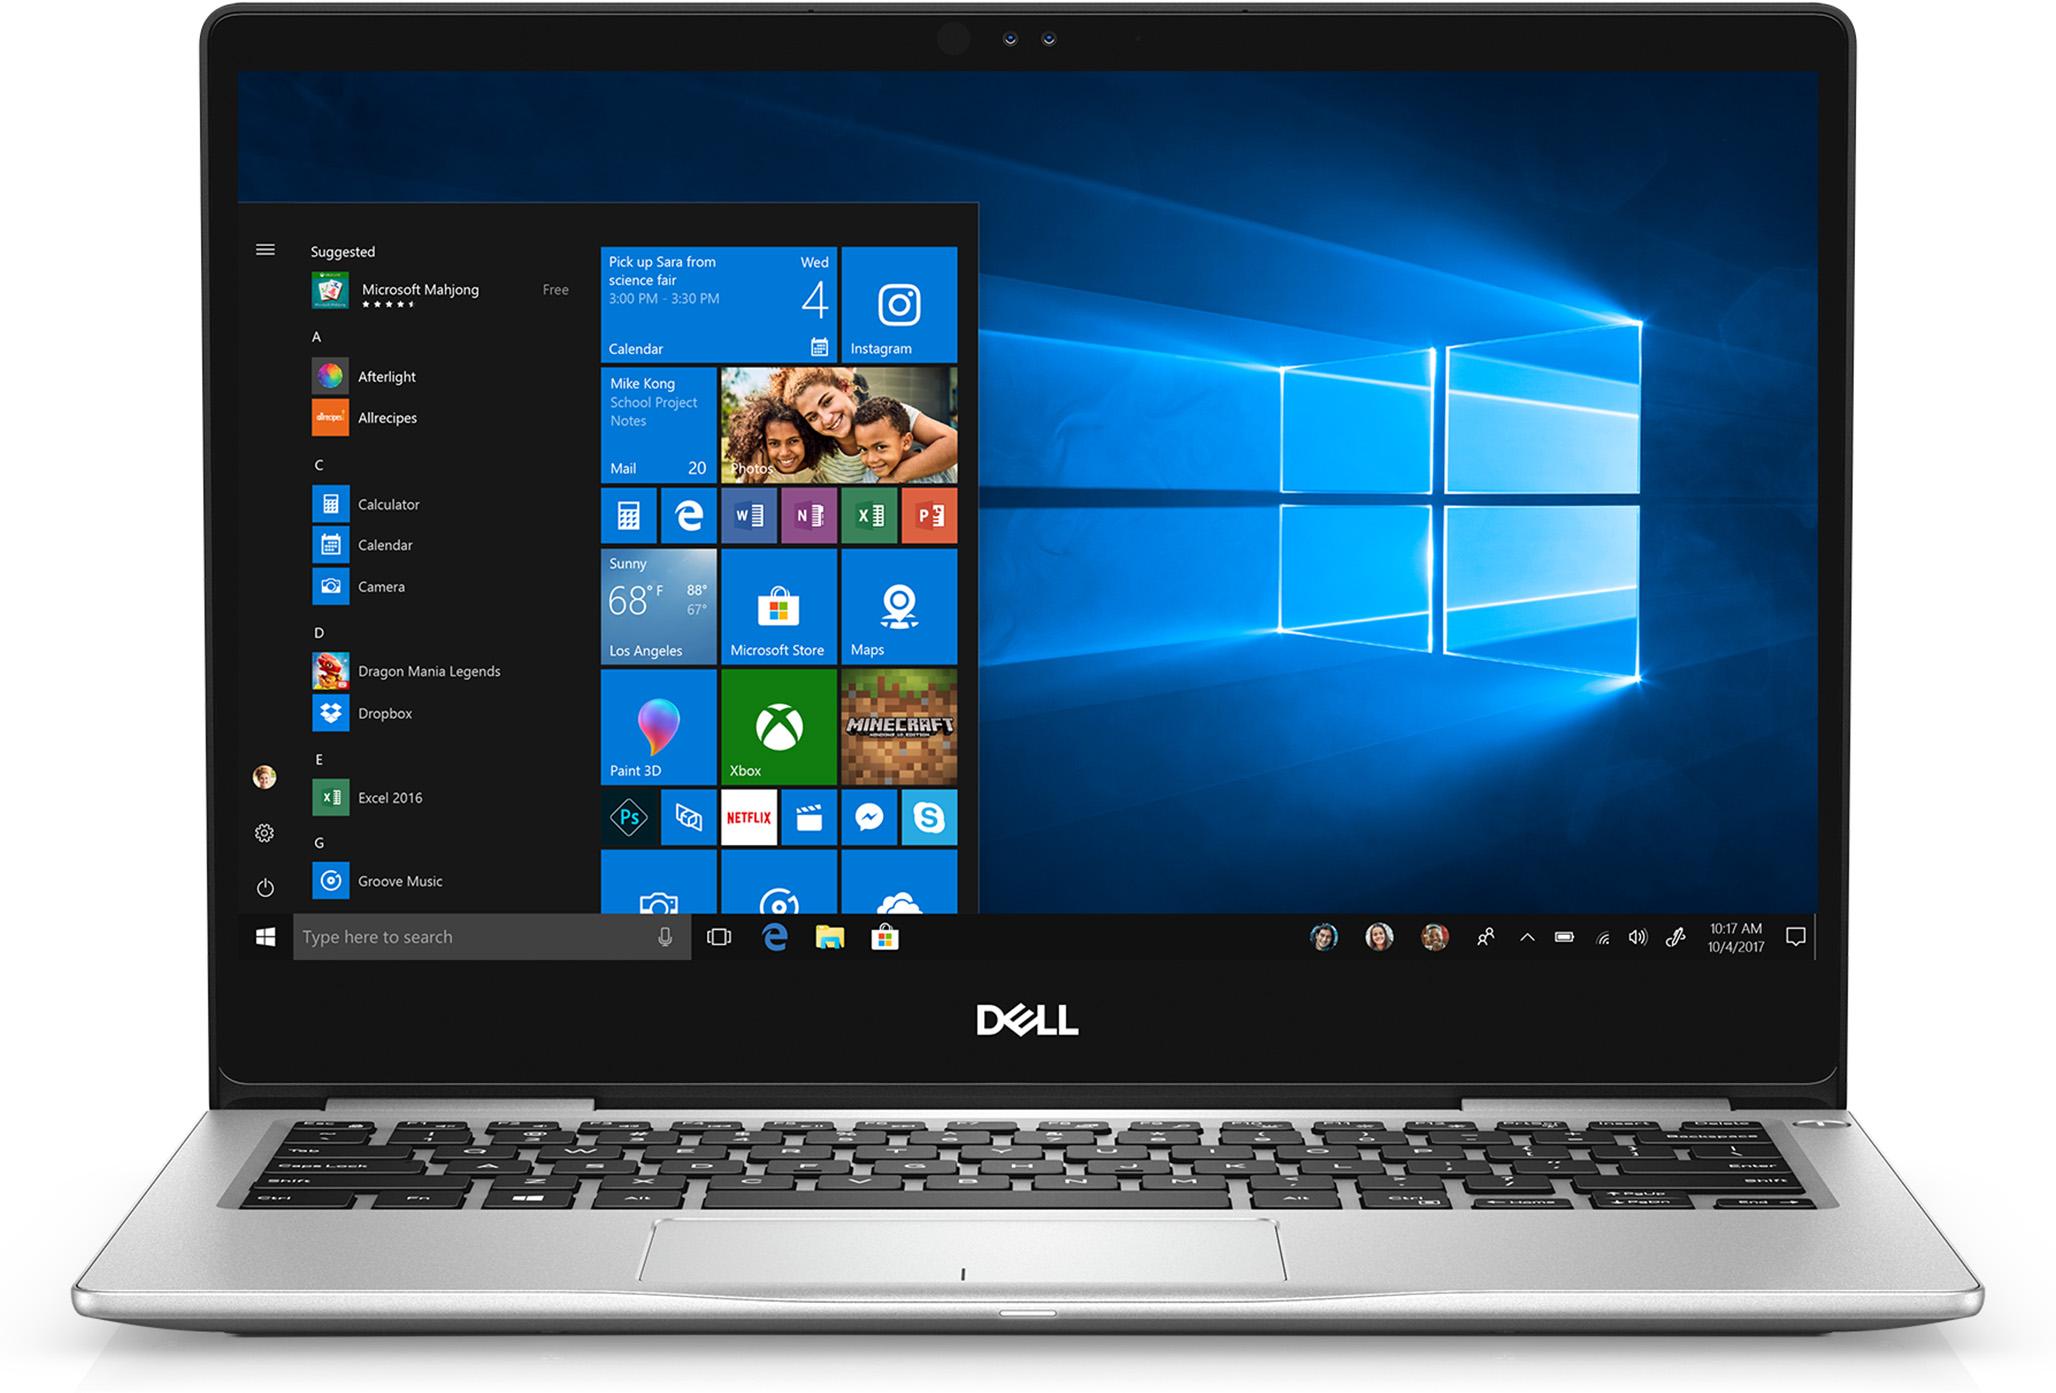 Dell Inspiron 13 i7370-5593SLV-PUS Laptop• 13.3-inch Full HD touchscreen • Intel i5 8th Gen • 8GB memory/256GB SSD